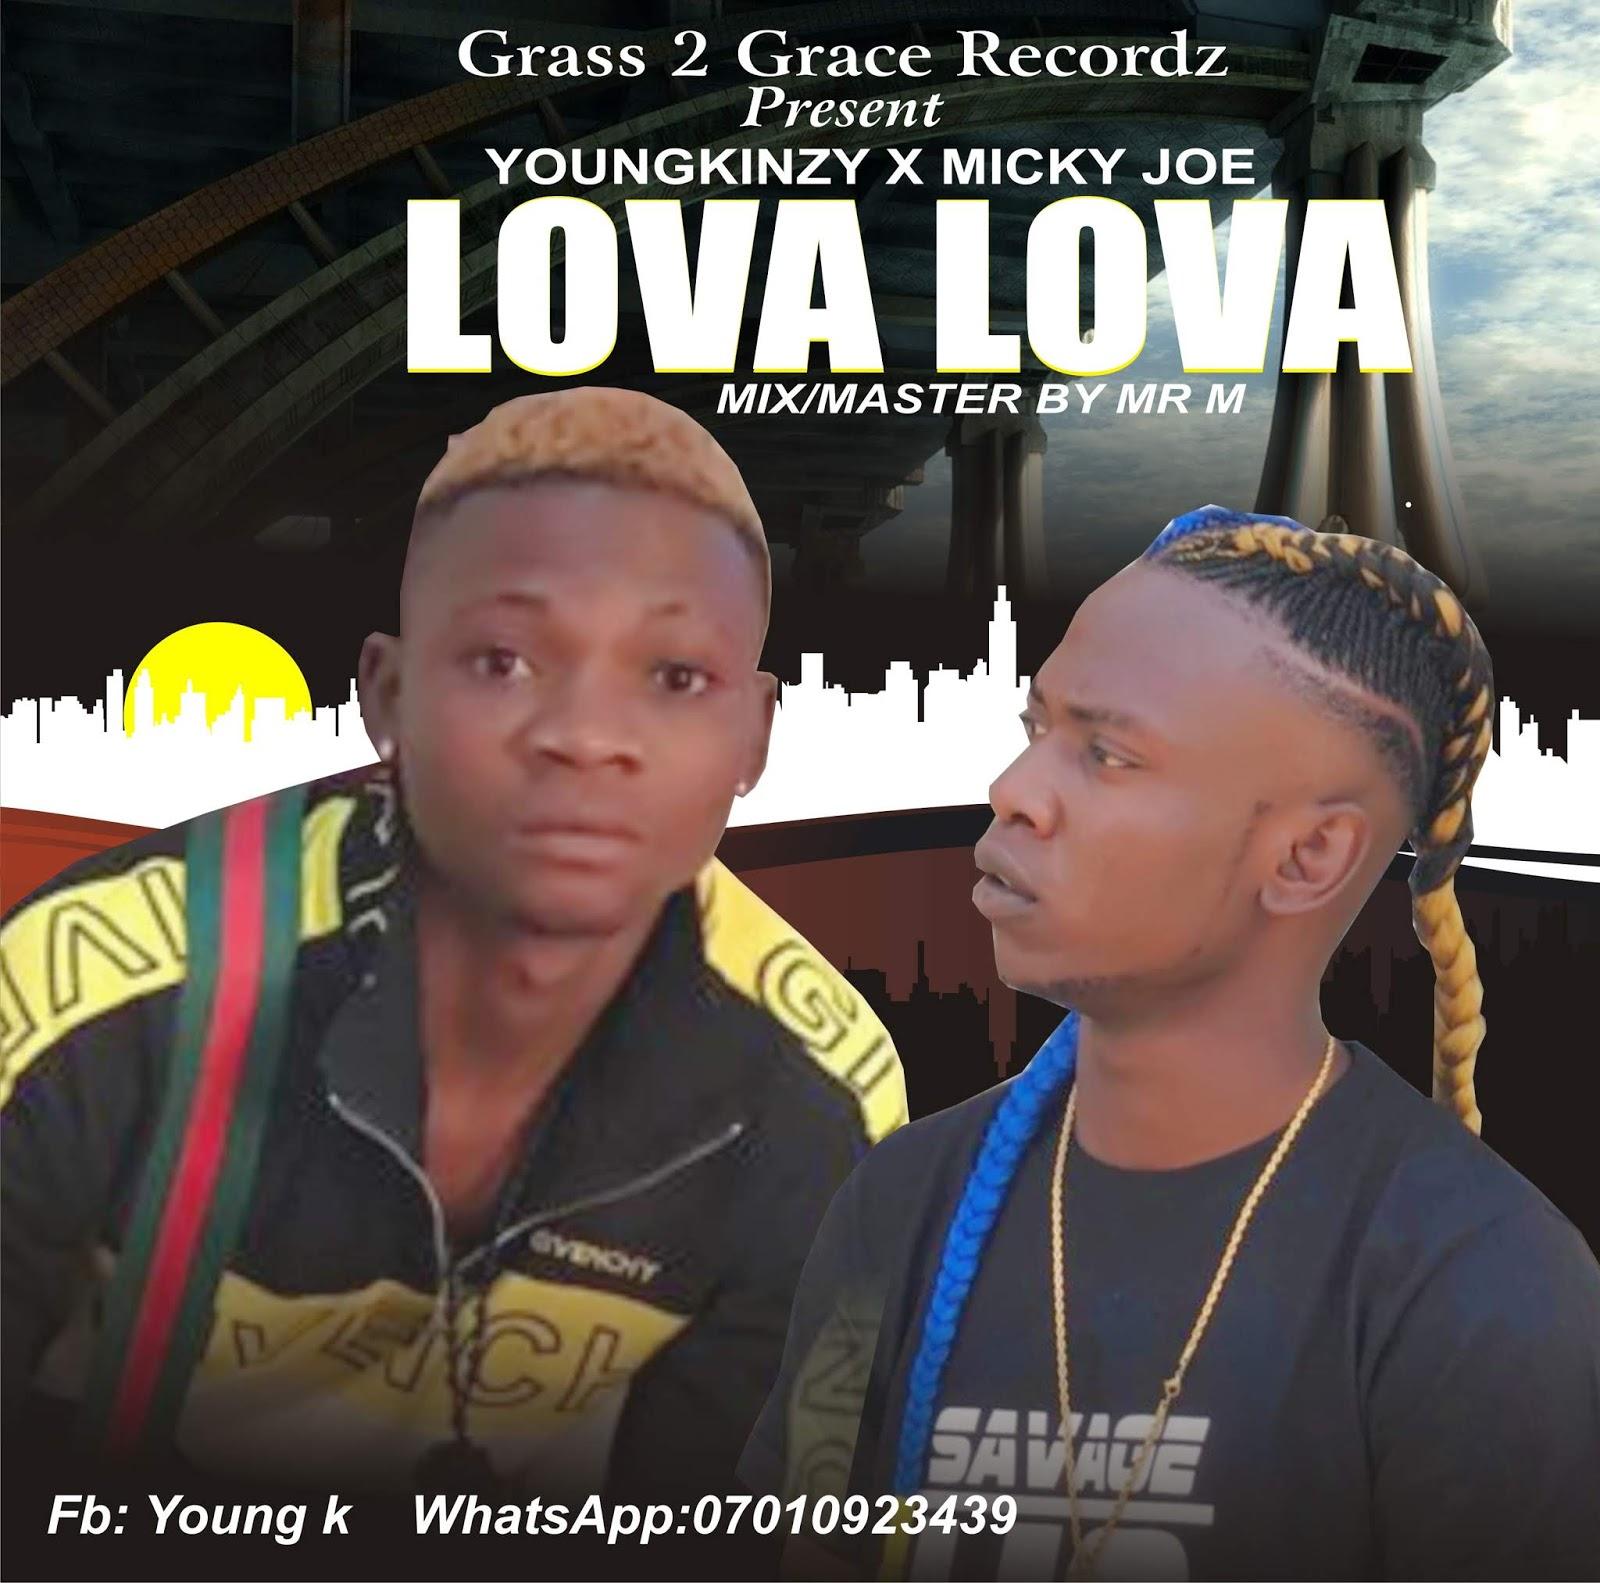 Download music: Youngking x MiCkY Joe Love Lova